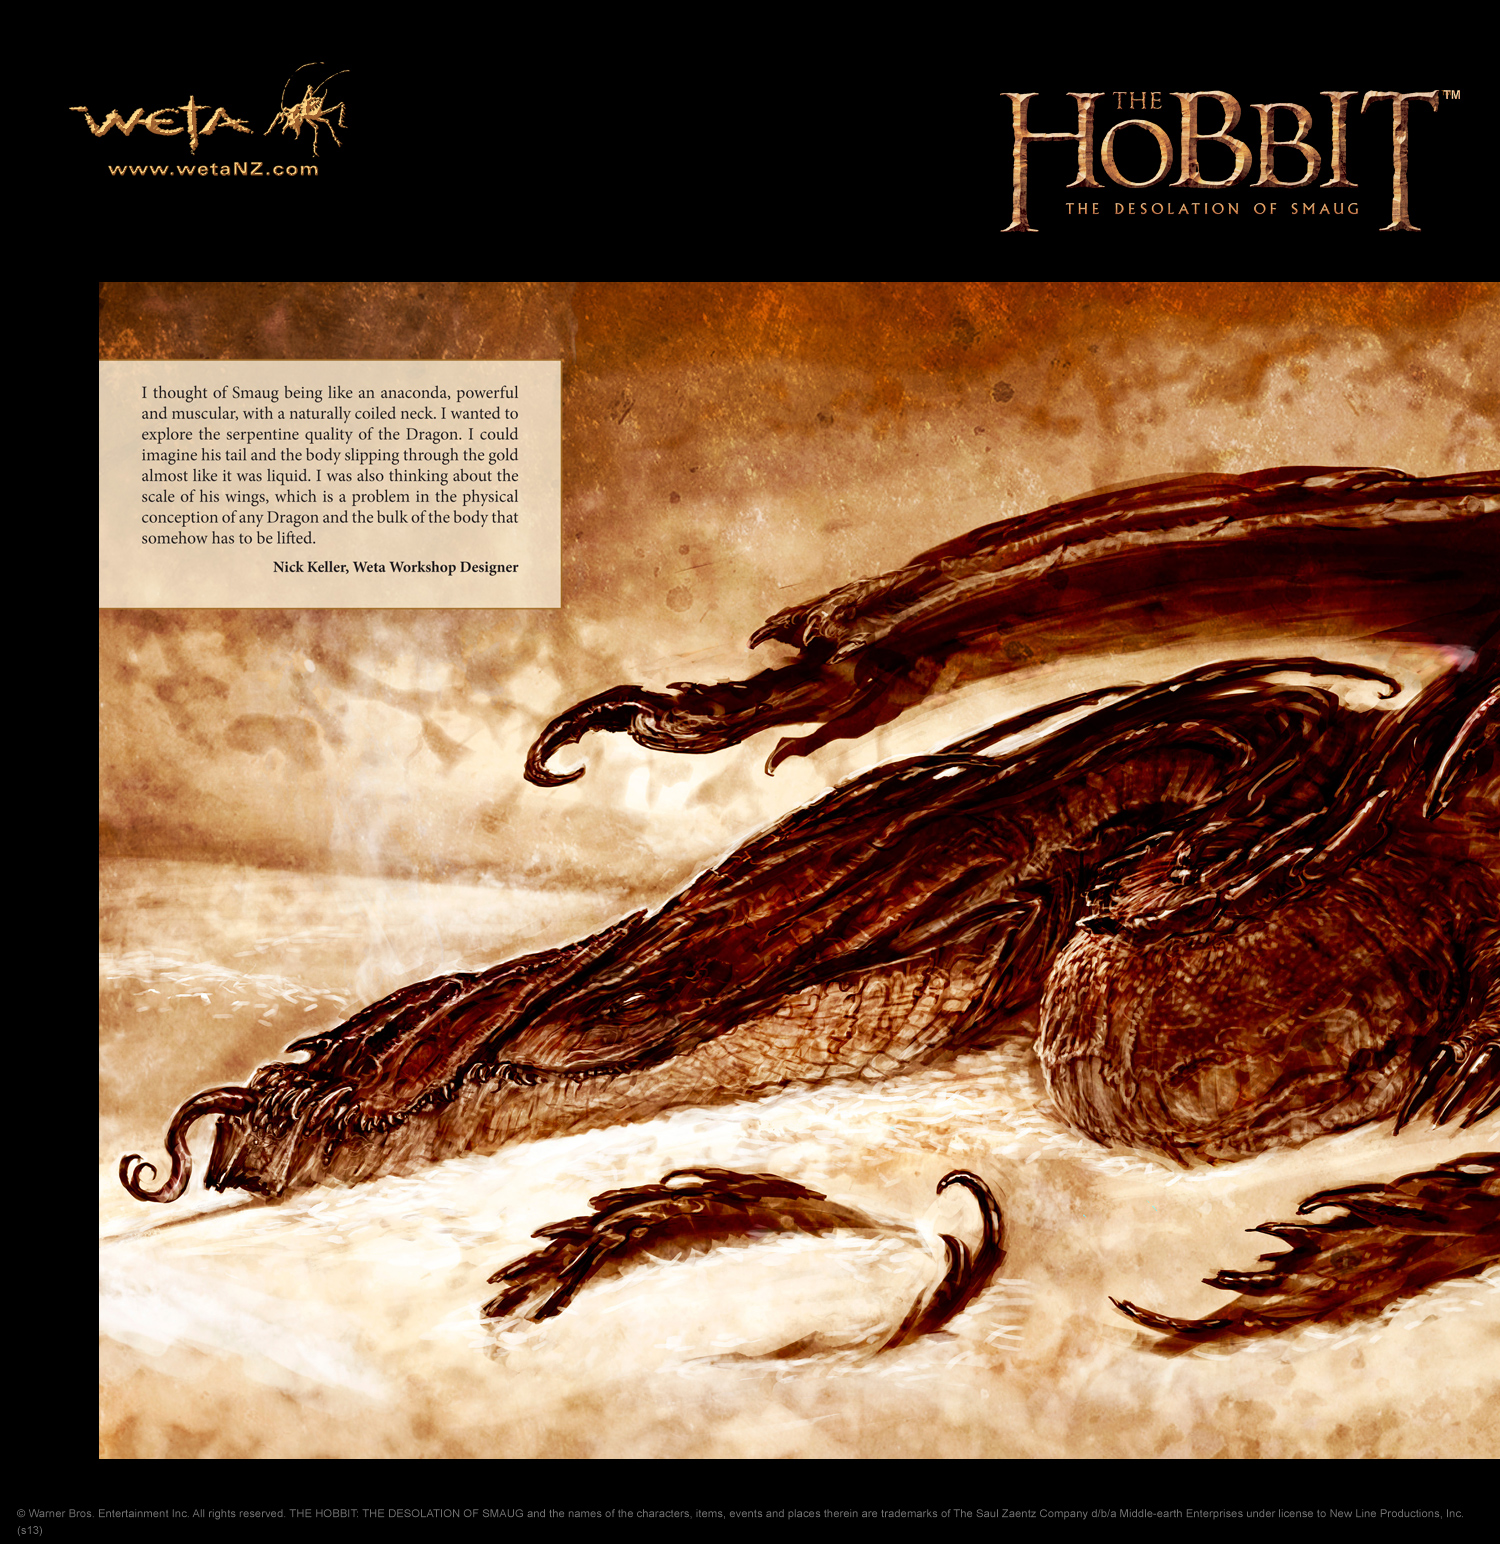 hobbit-SmaugBooksamplespread1lrg2